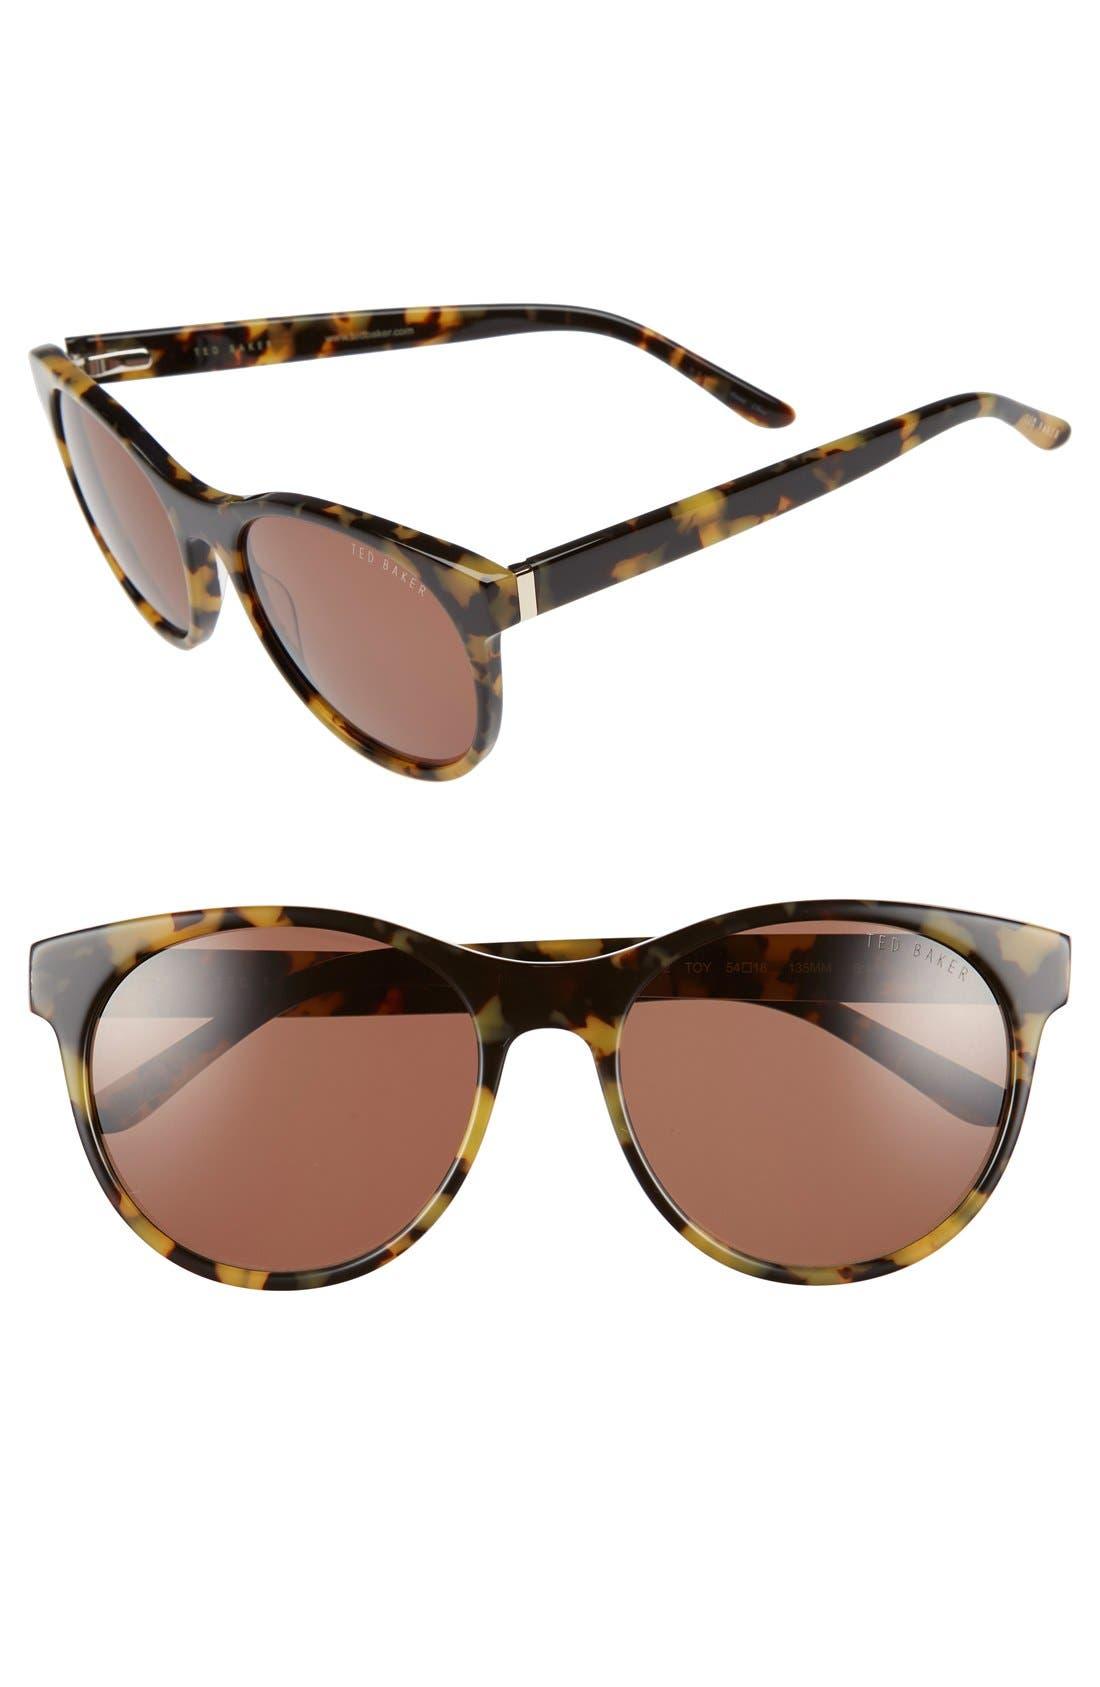 54mm Retro Sunglasses,                             Main thumbnail 1, color,                             Tokyo Tortoise